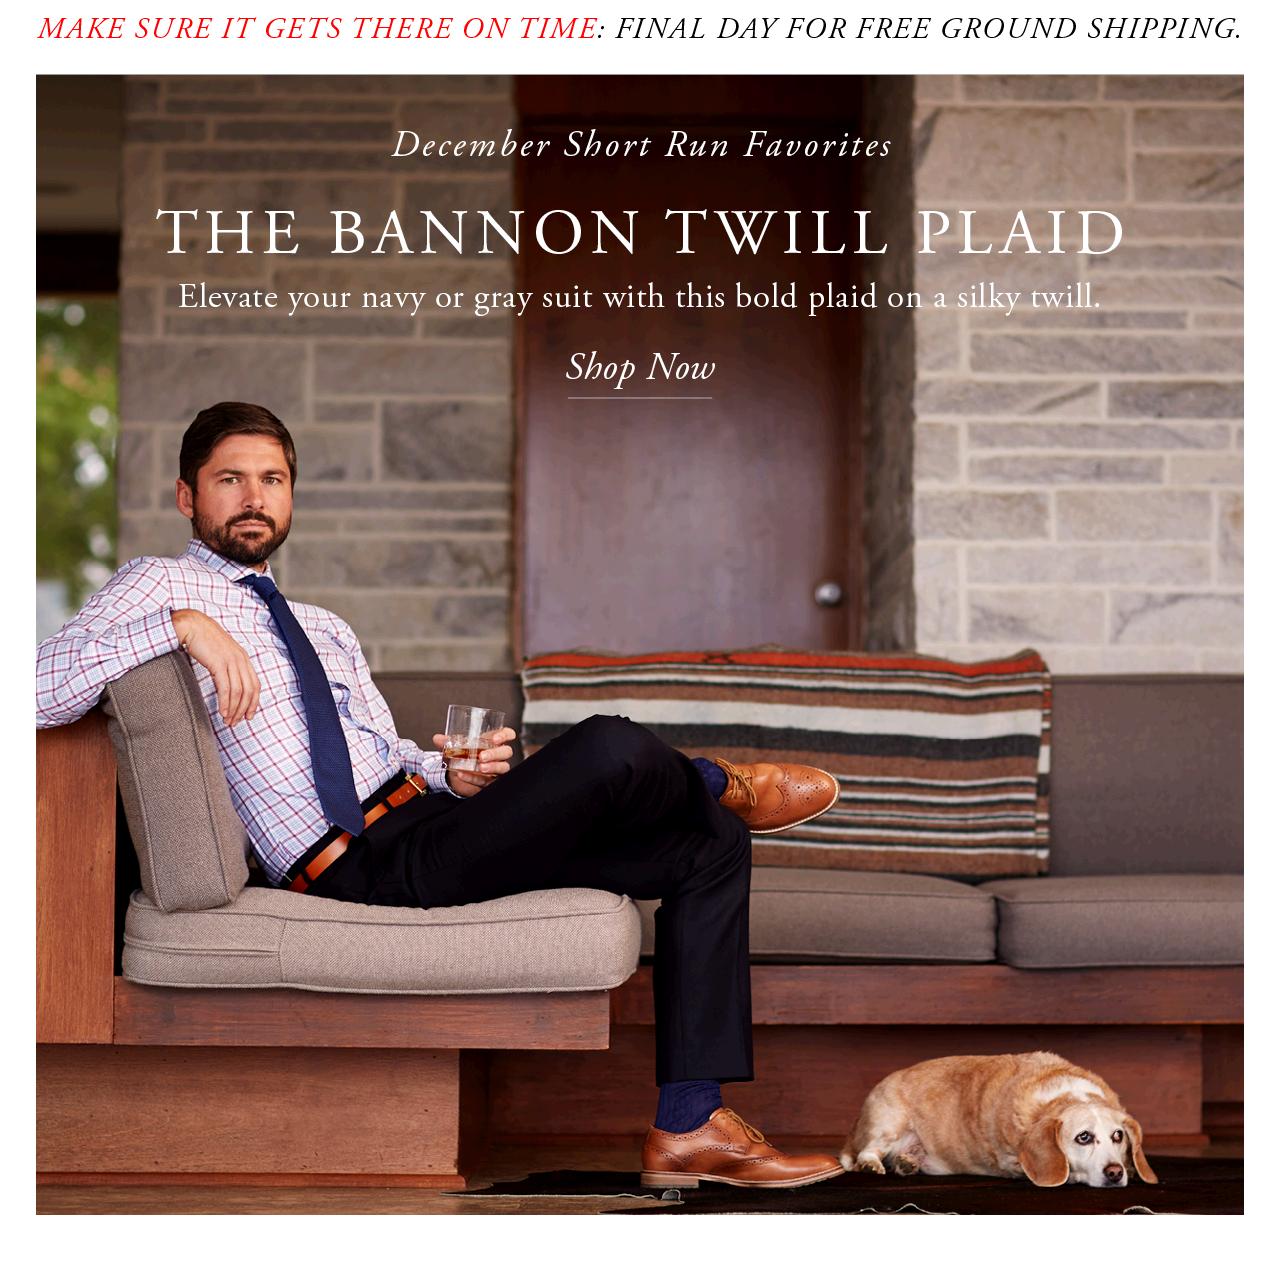 The Bannon Twill Plaid